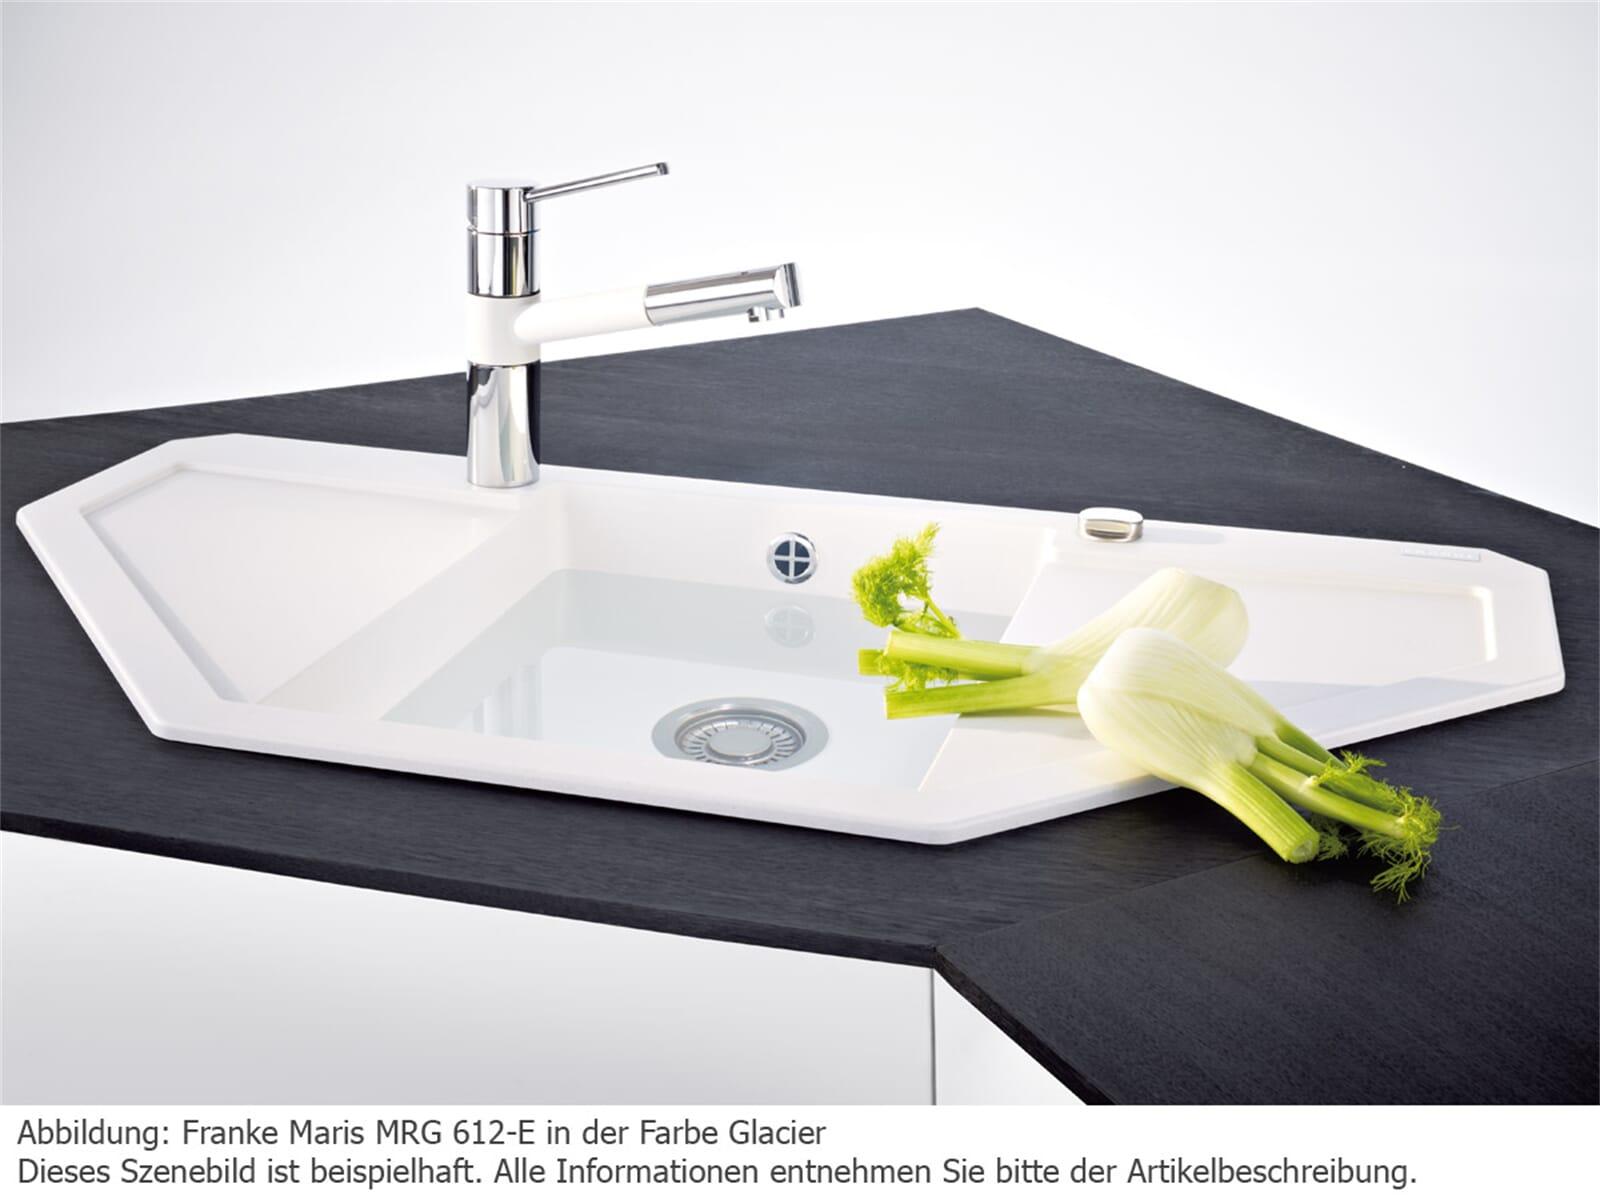 fragranit sp le reparieren dekoration bild idee. Black Bedroom Furniture Sets. Home Design Ideas